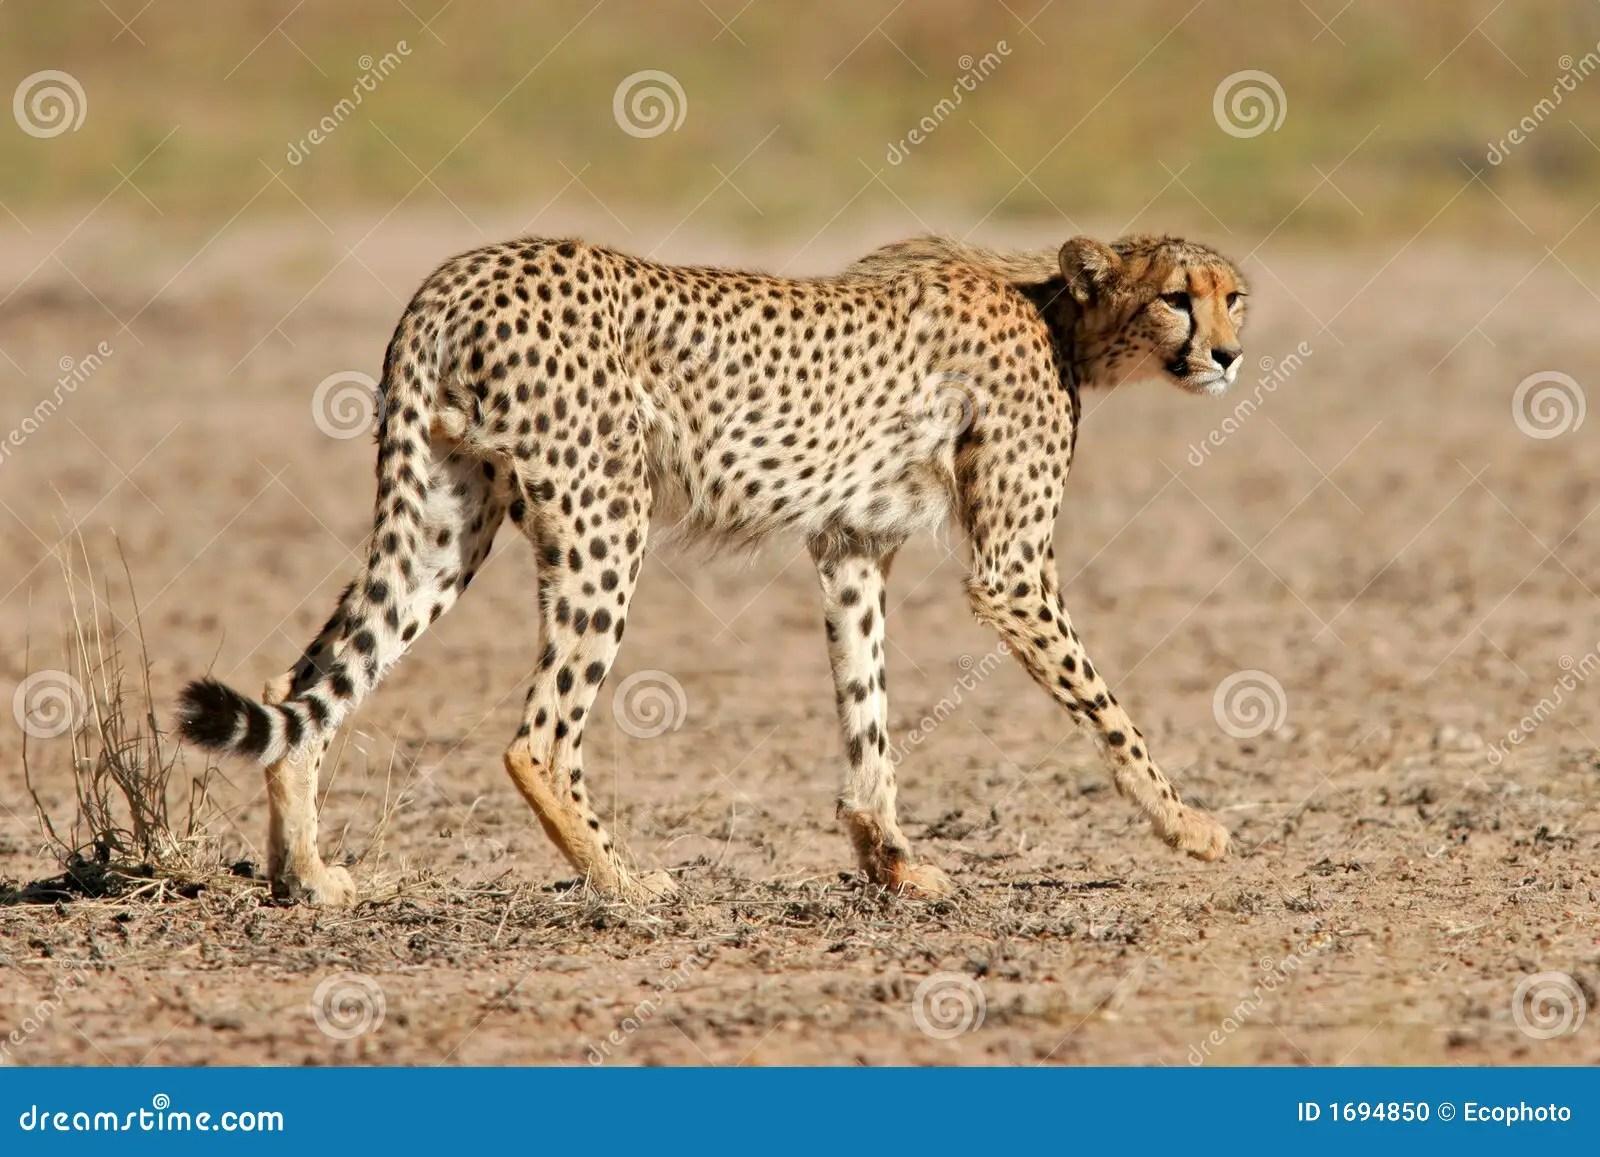 Desert Animal Print Pictures